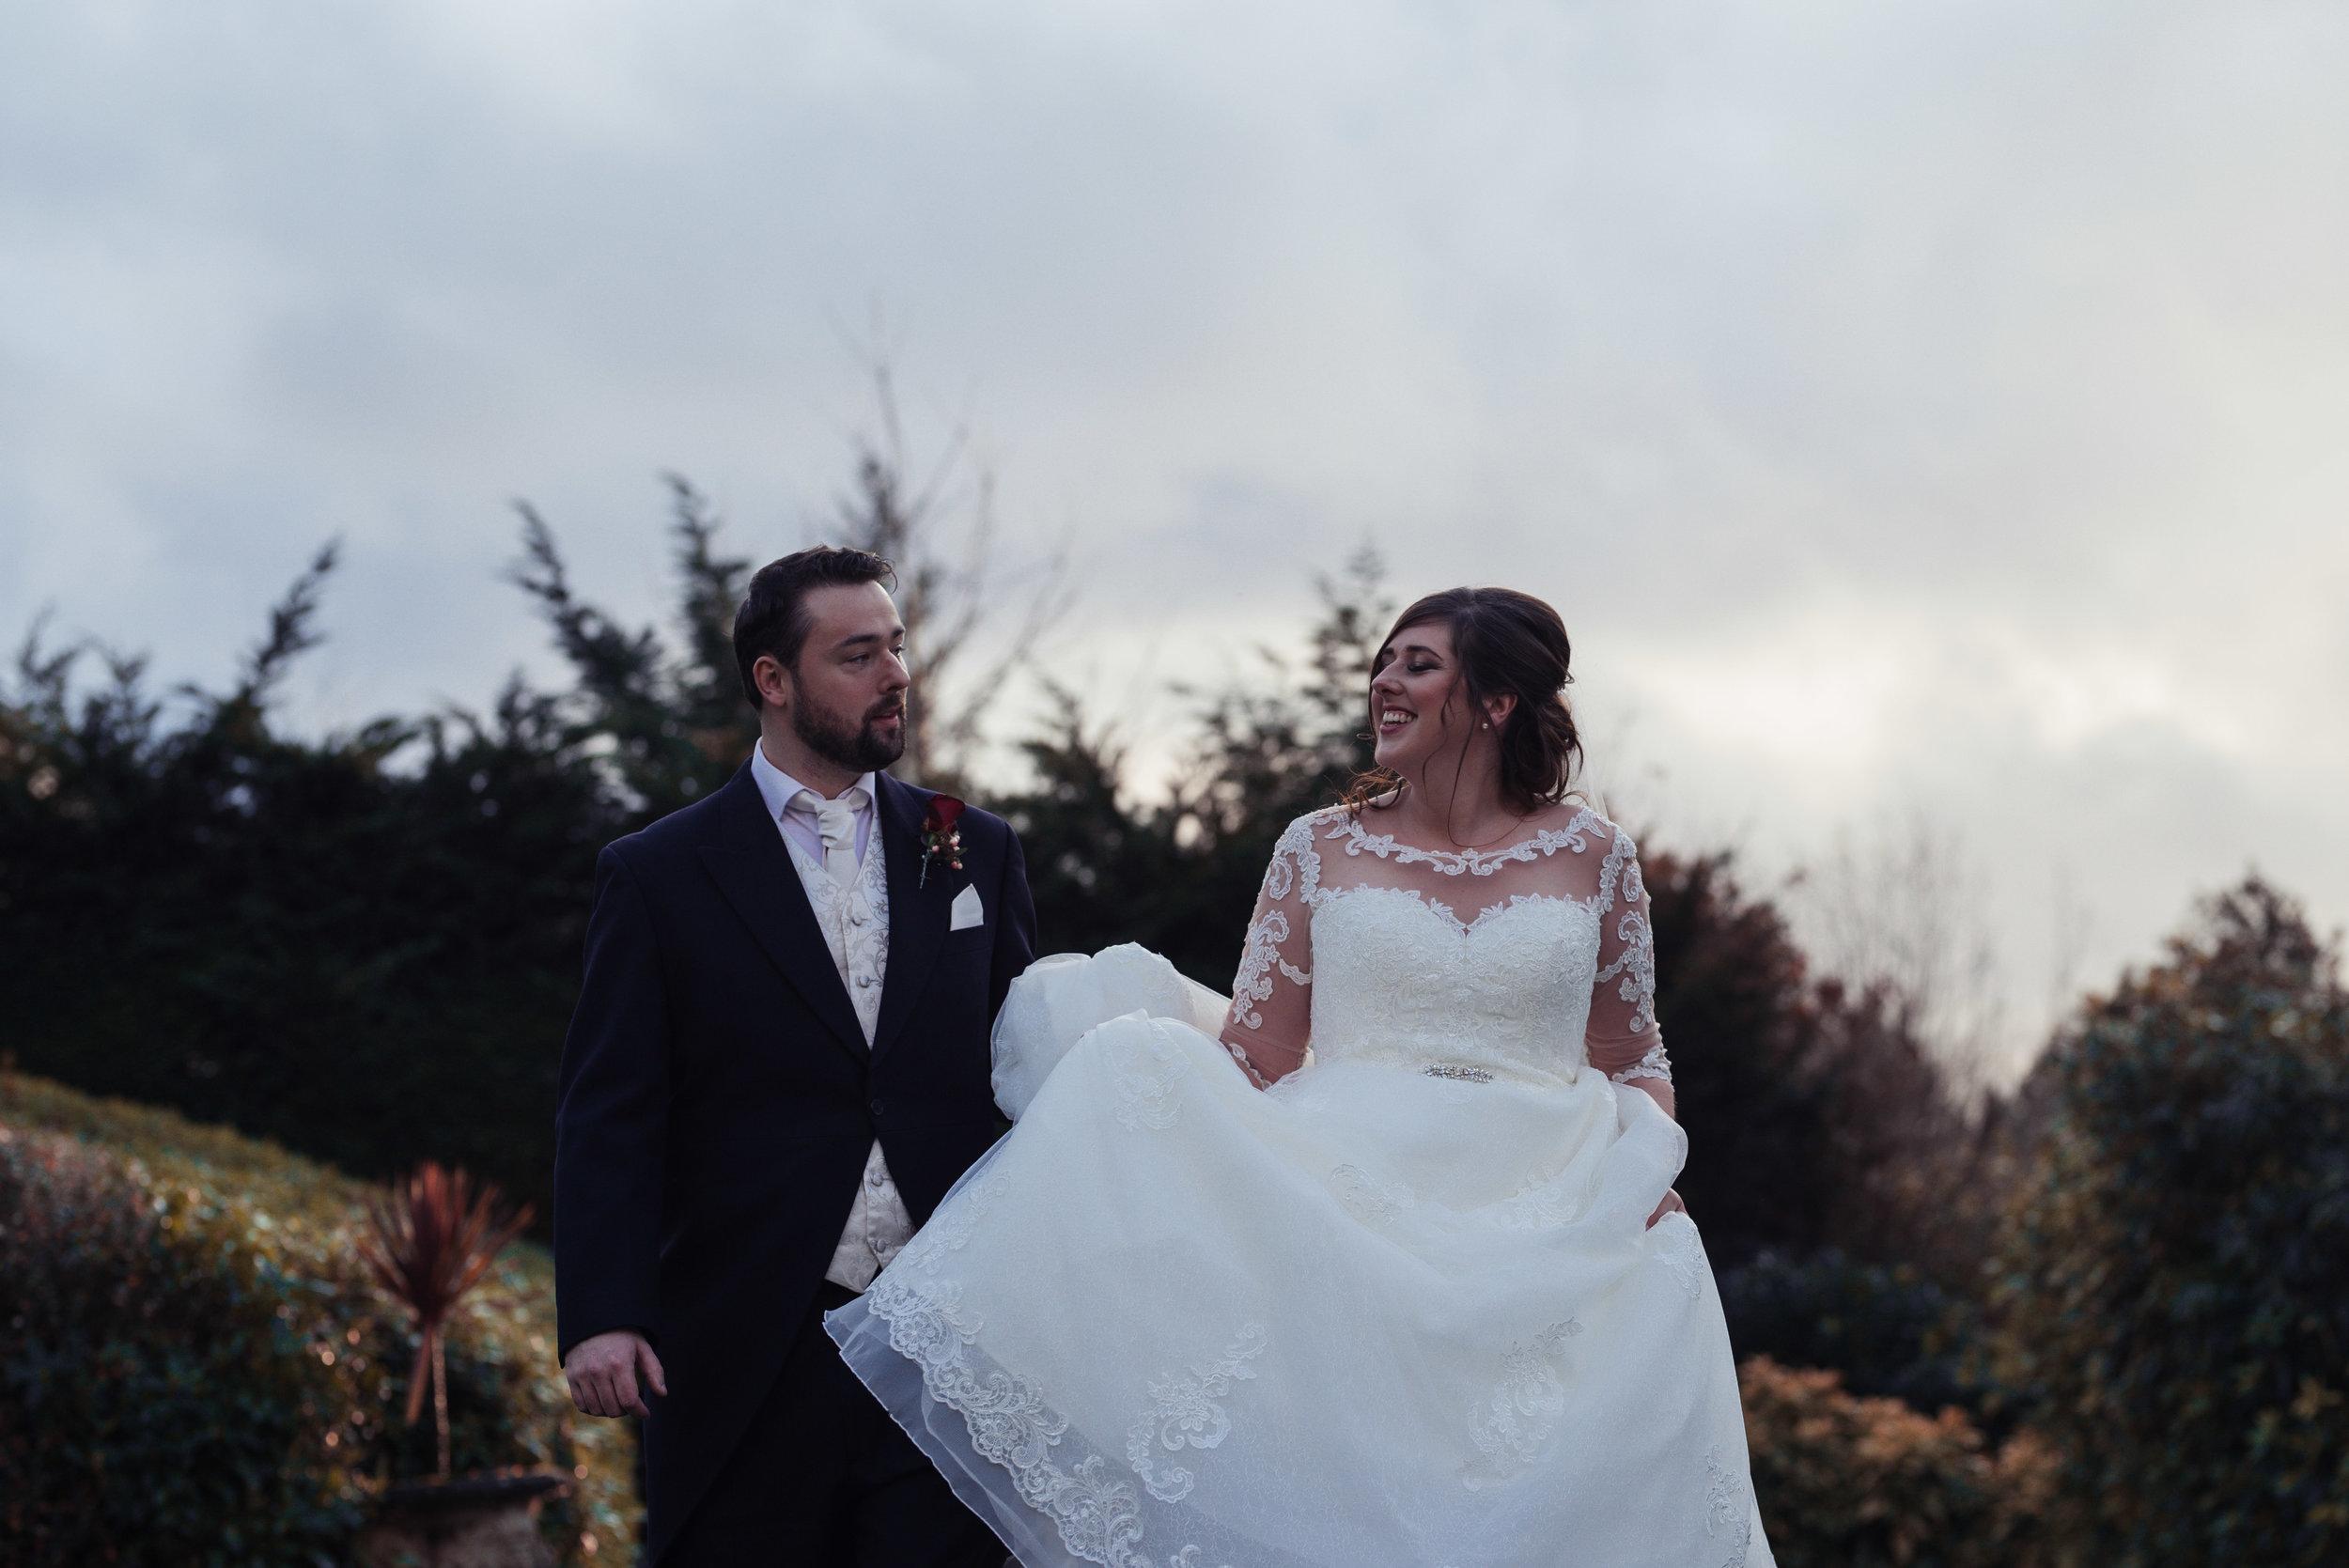 Belsfield-wedding-photography-30.jpg